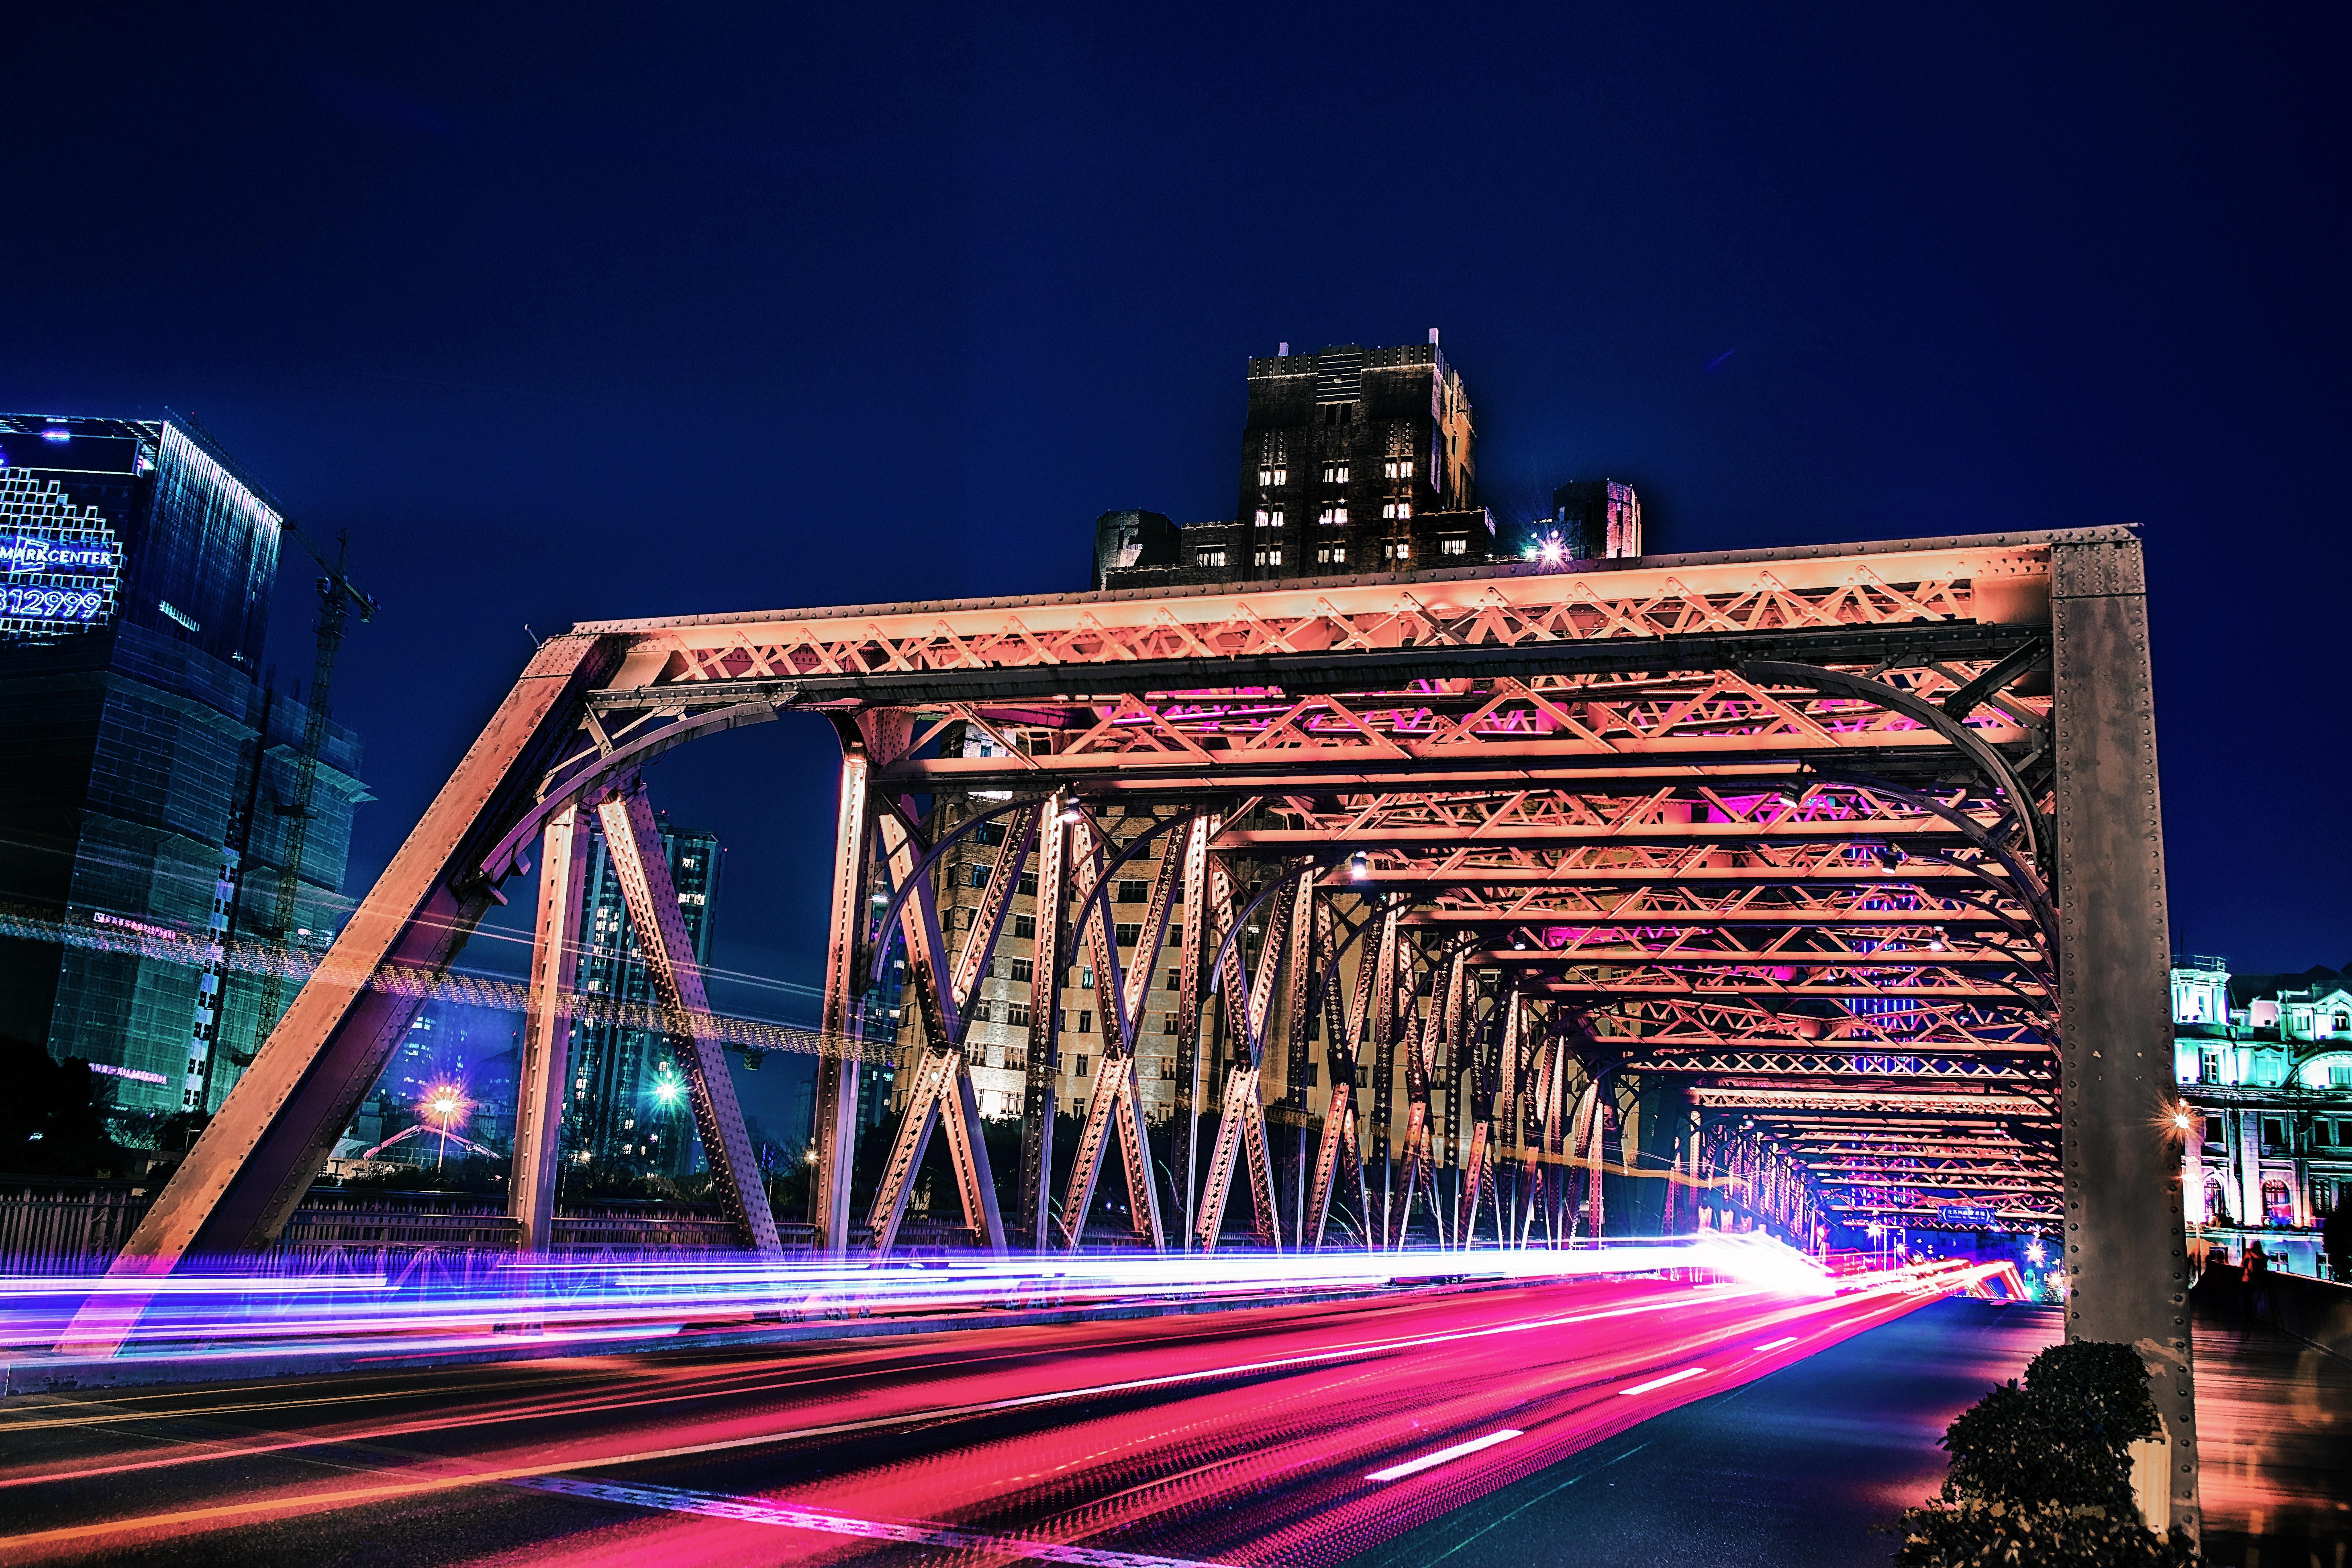 Bridge in Time-lapse Photo, Architecture, Long exposure, Urban, Travel, HQ Photo